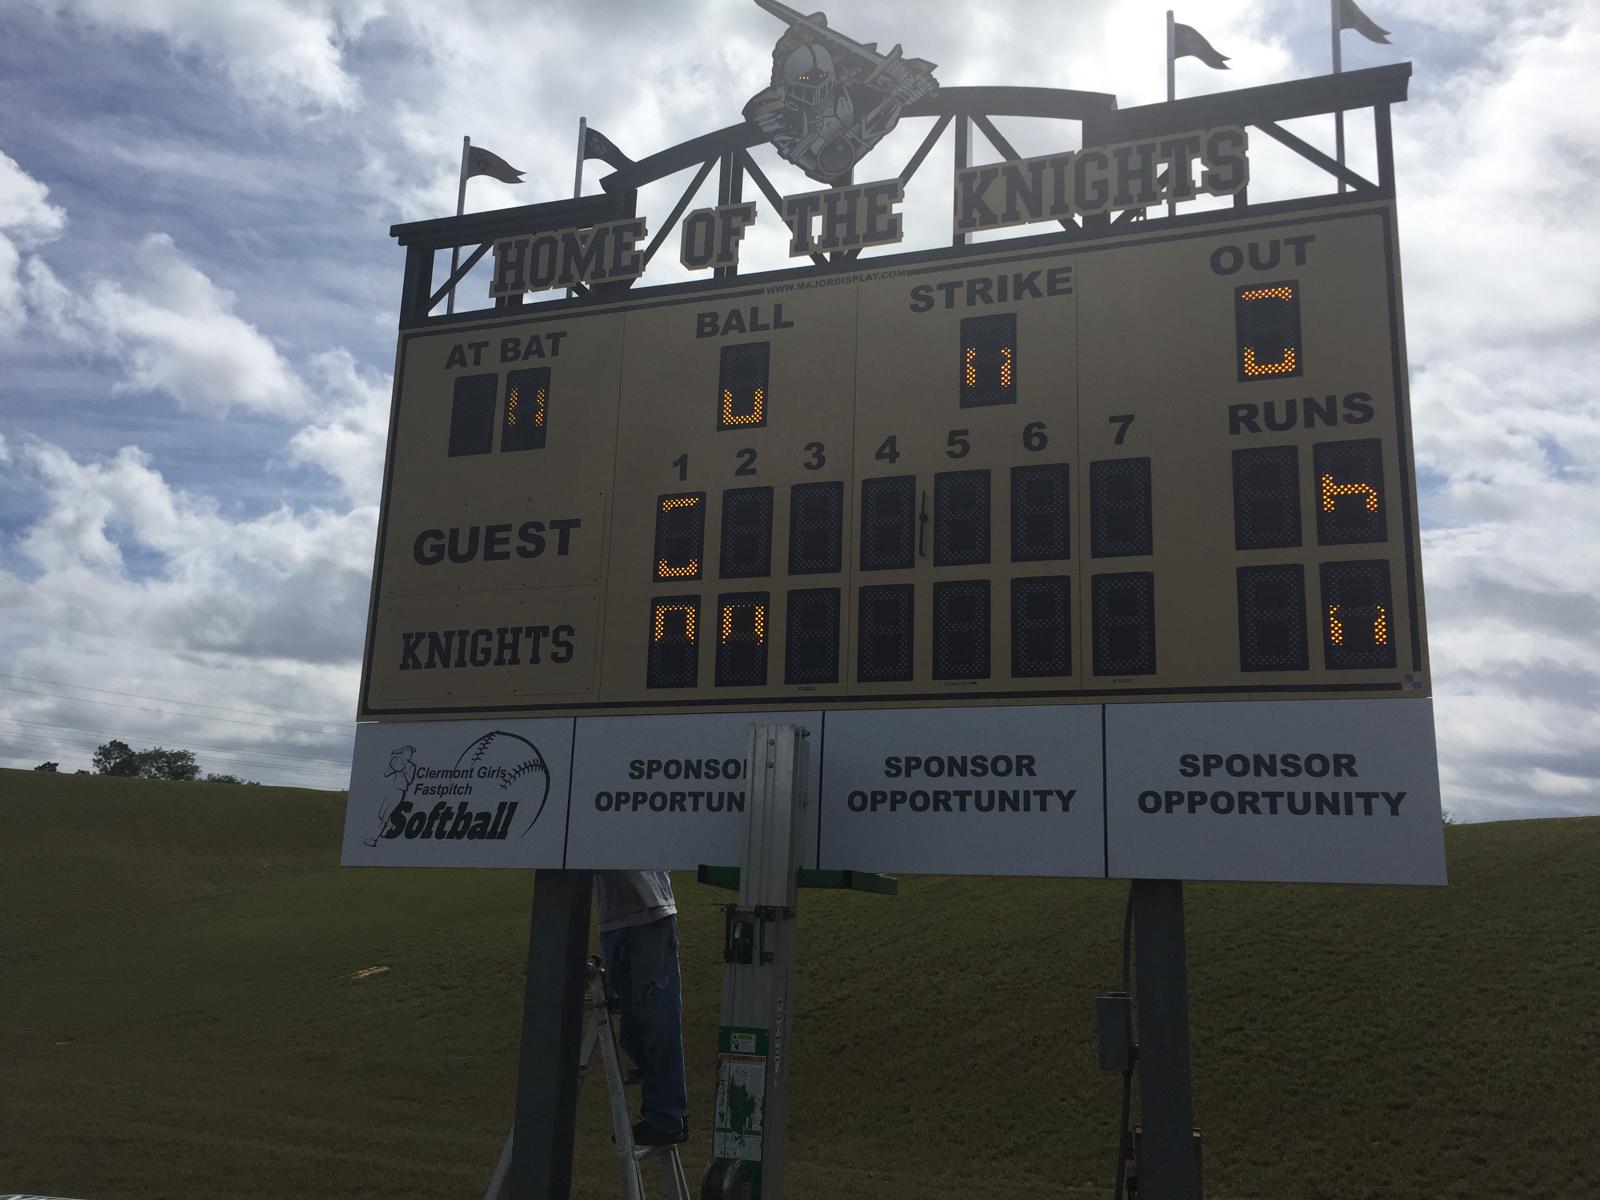 Looking for sponsors for new scoreboard